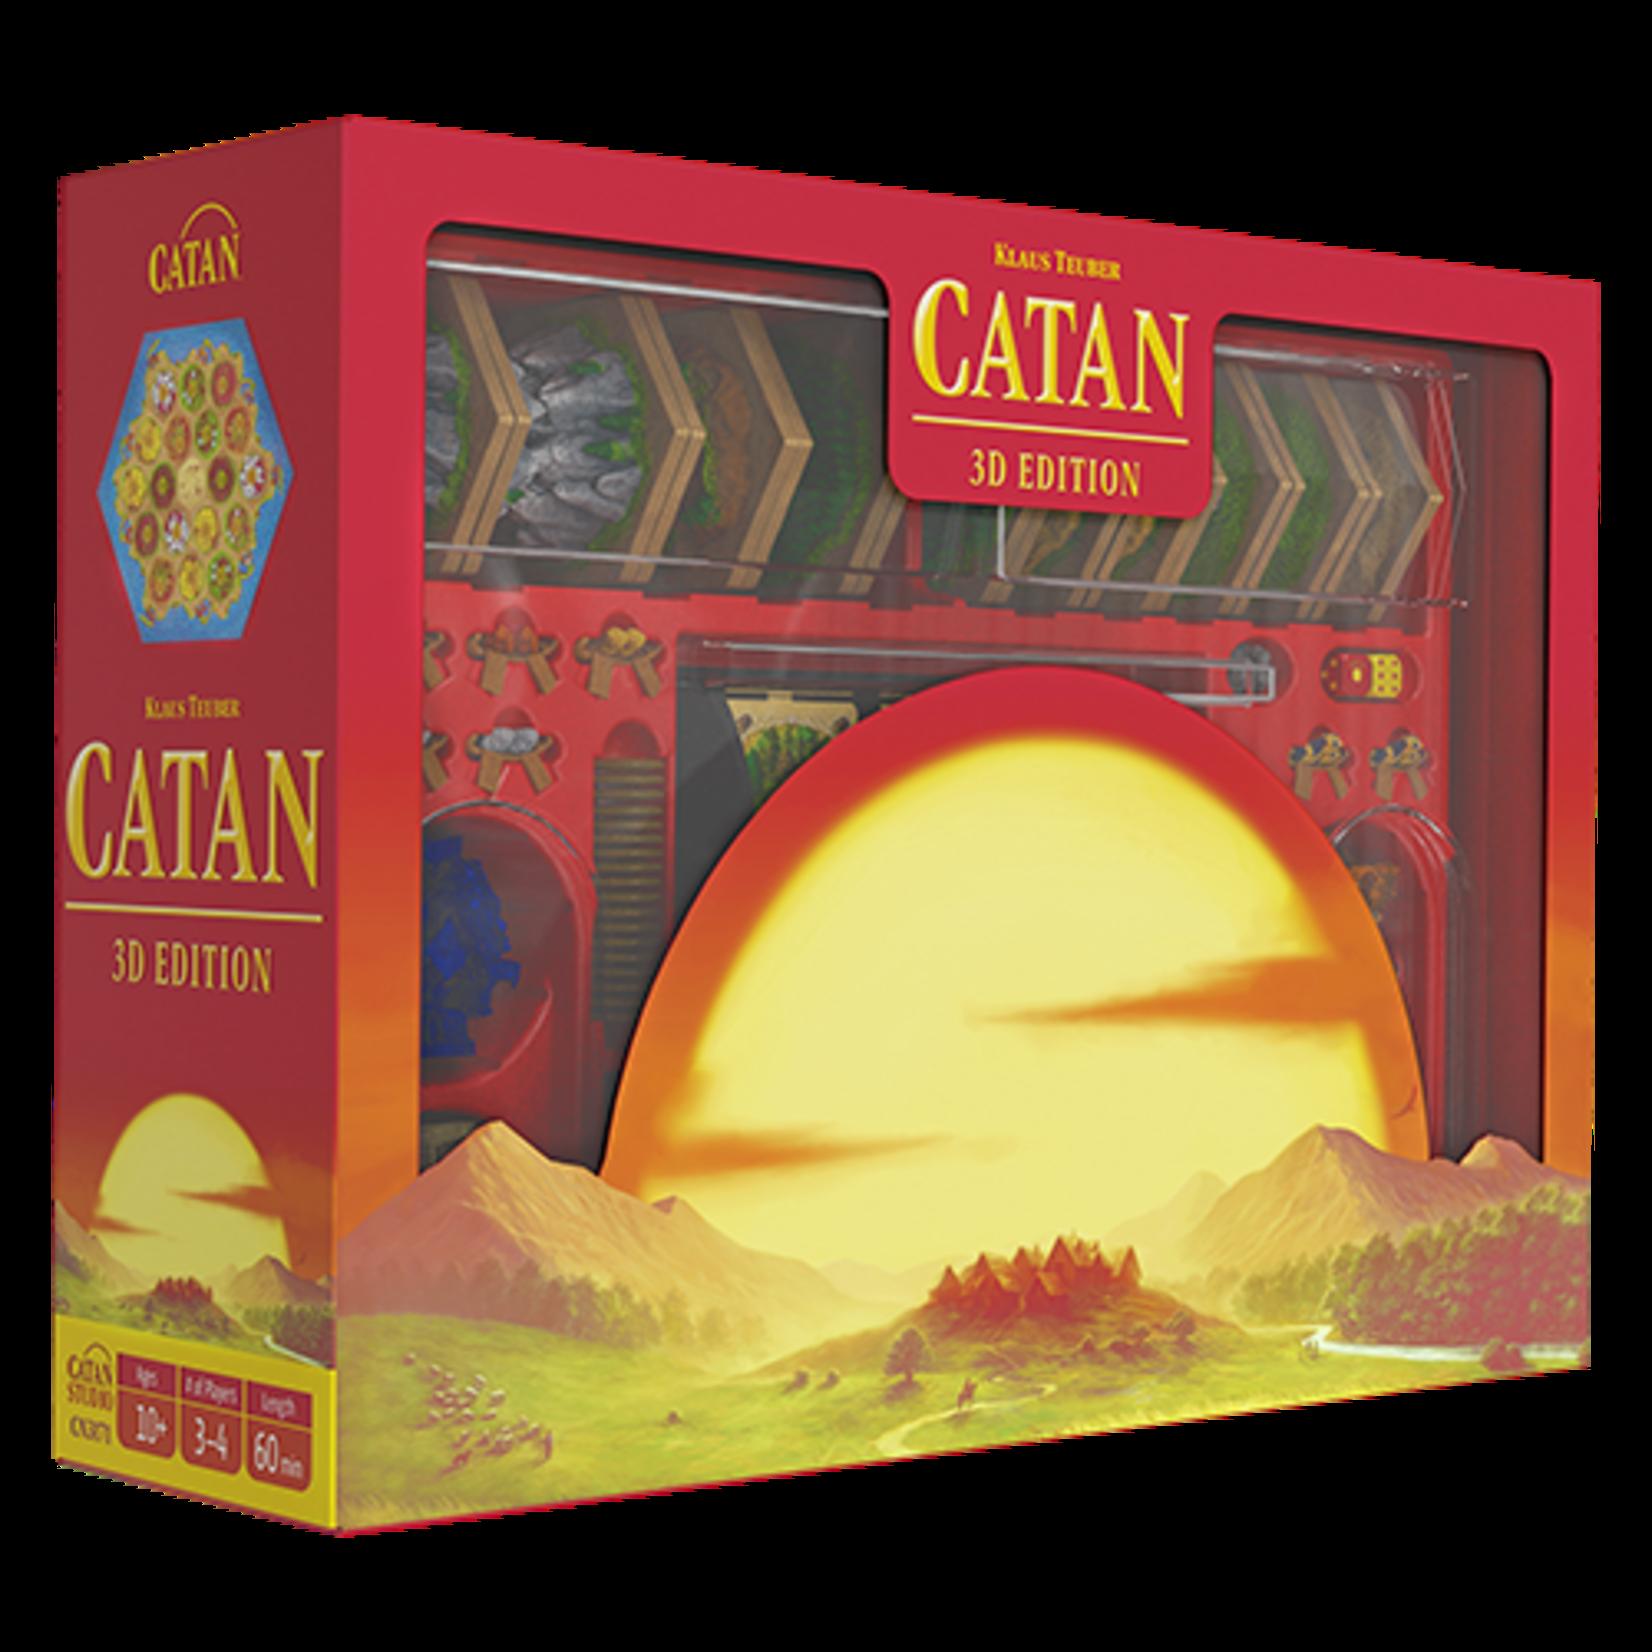 Pre Order Catan 3D Edition